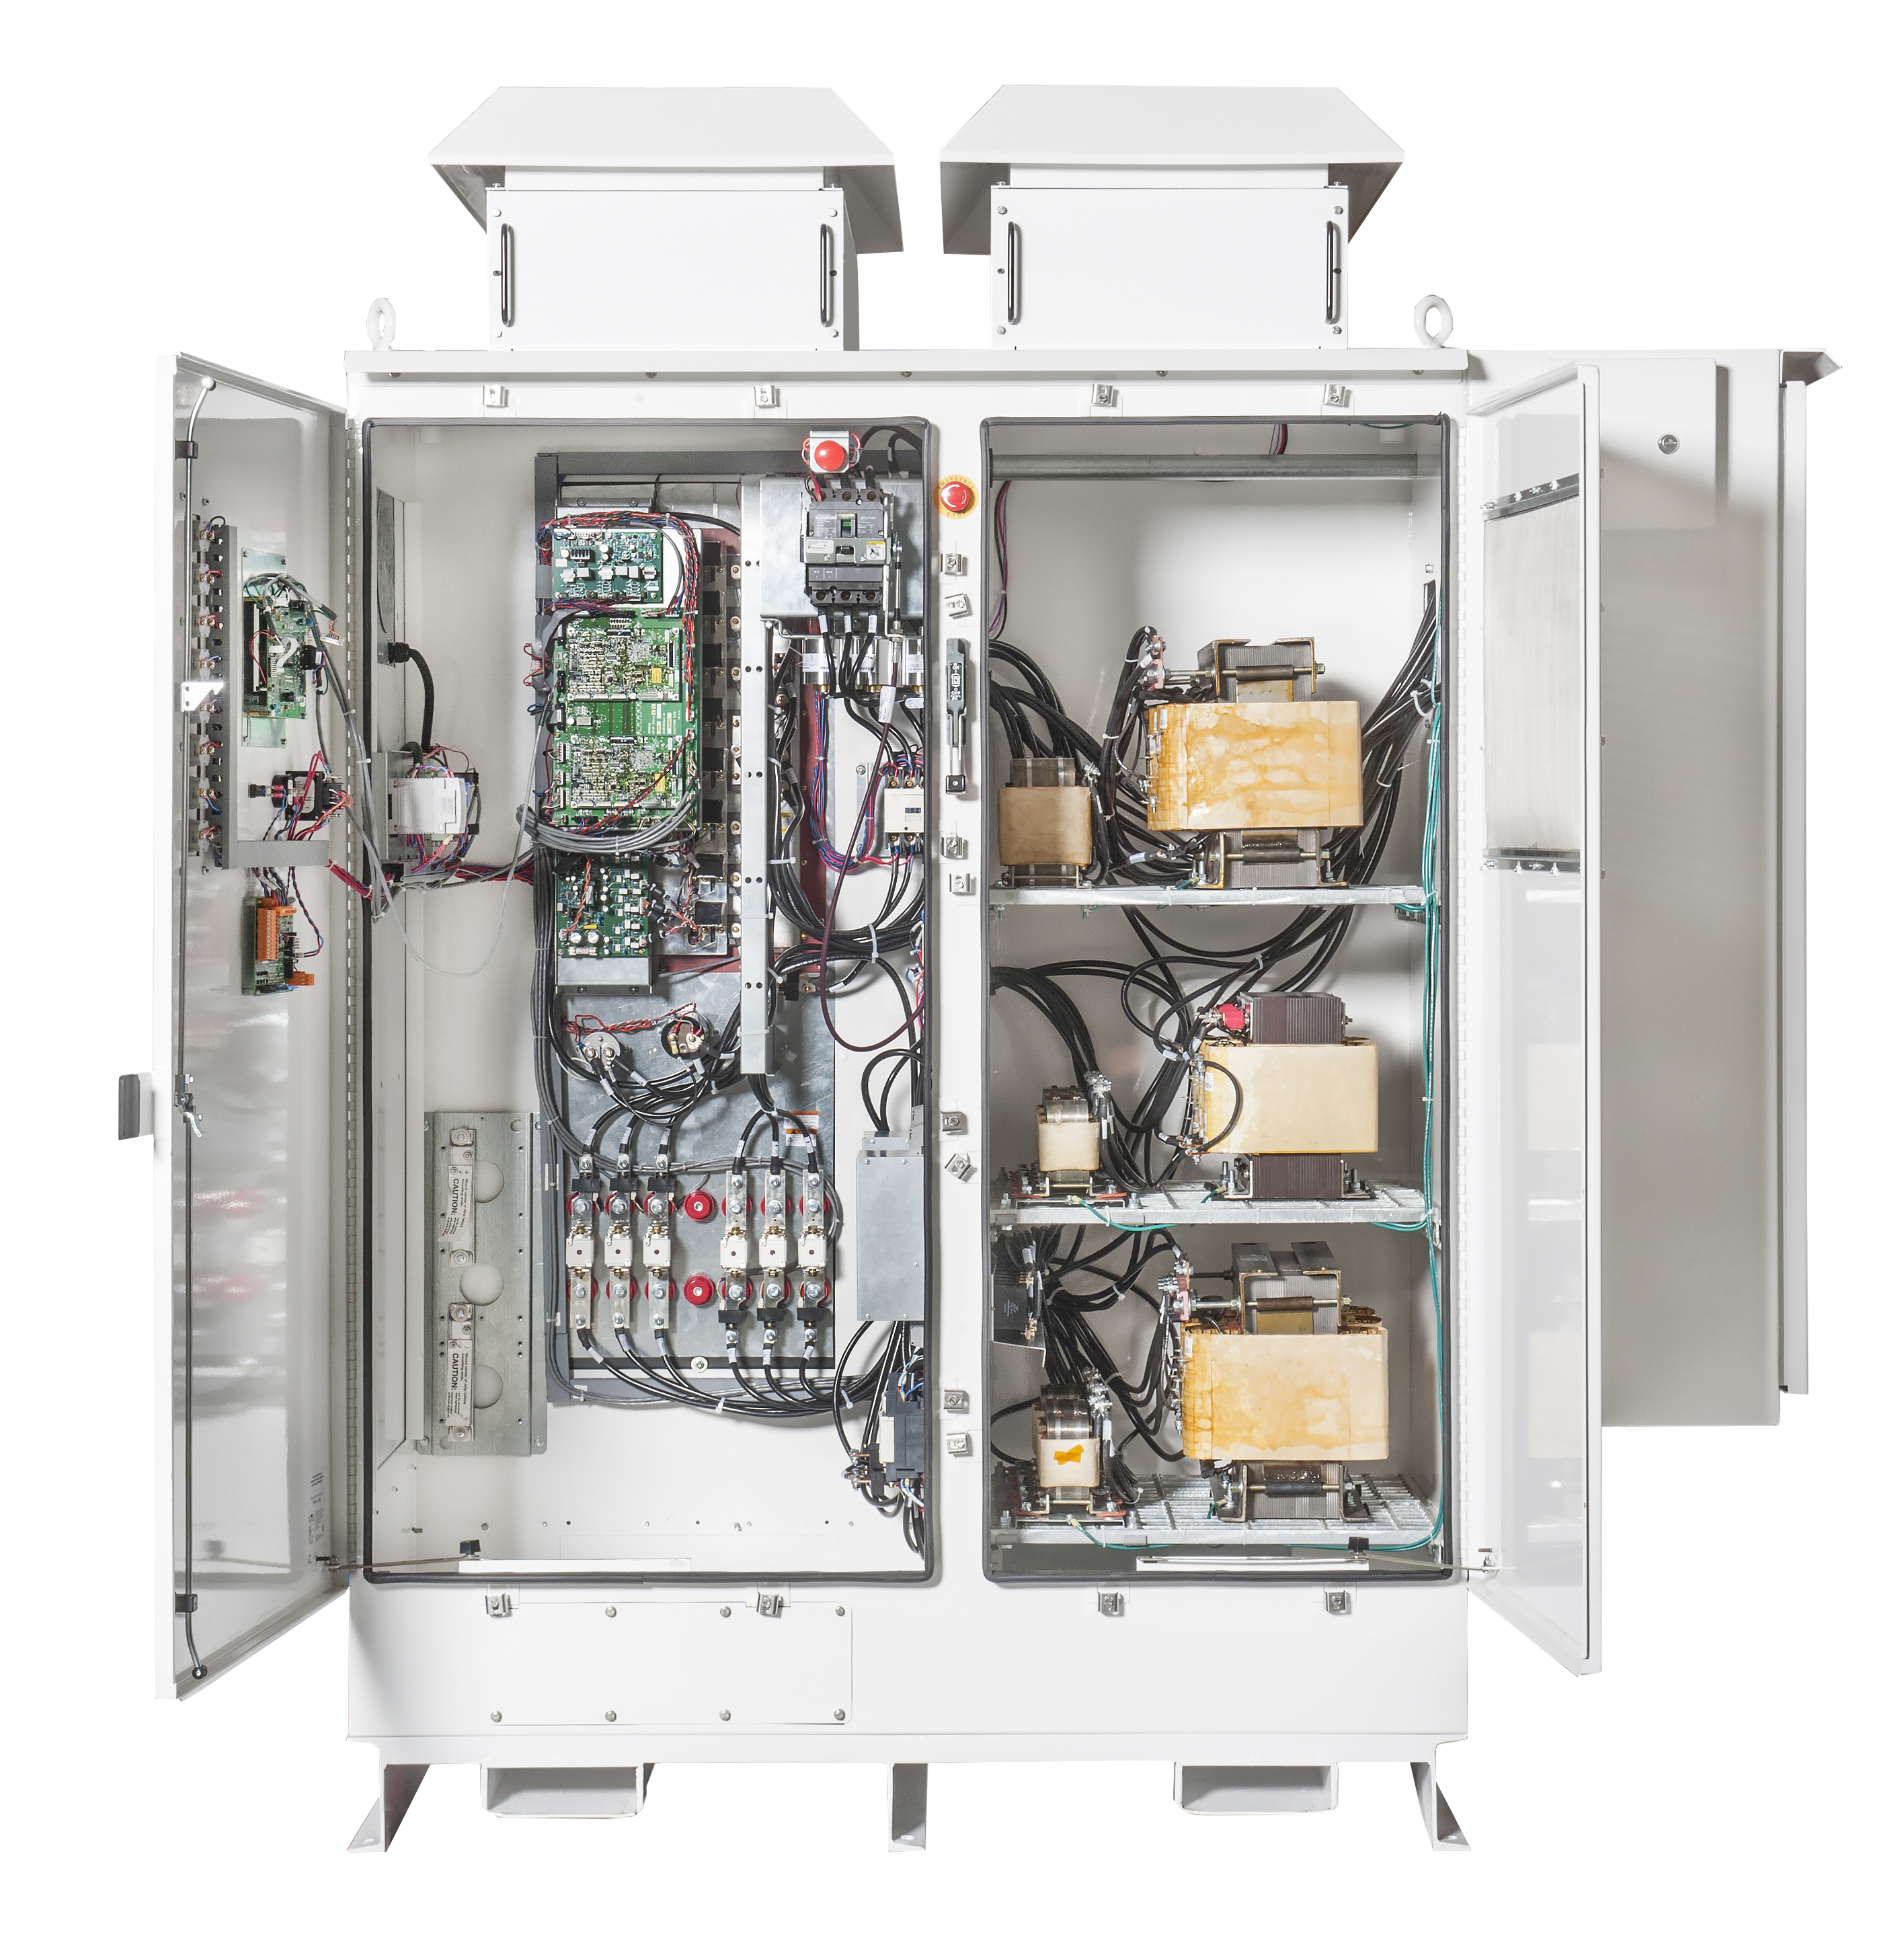 5000 Series 50kva Power Electronics Toshiba International Basic Uninterruptible Supply Circuit Product Image Gallery